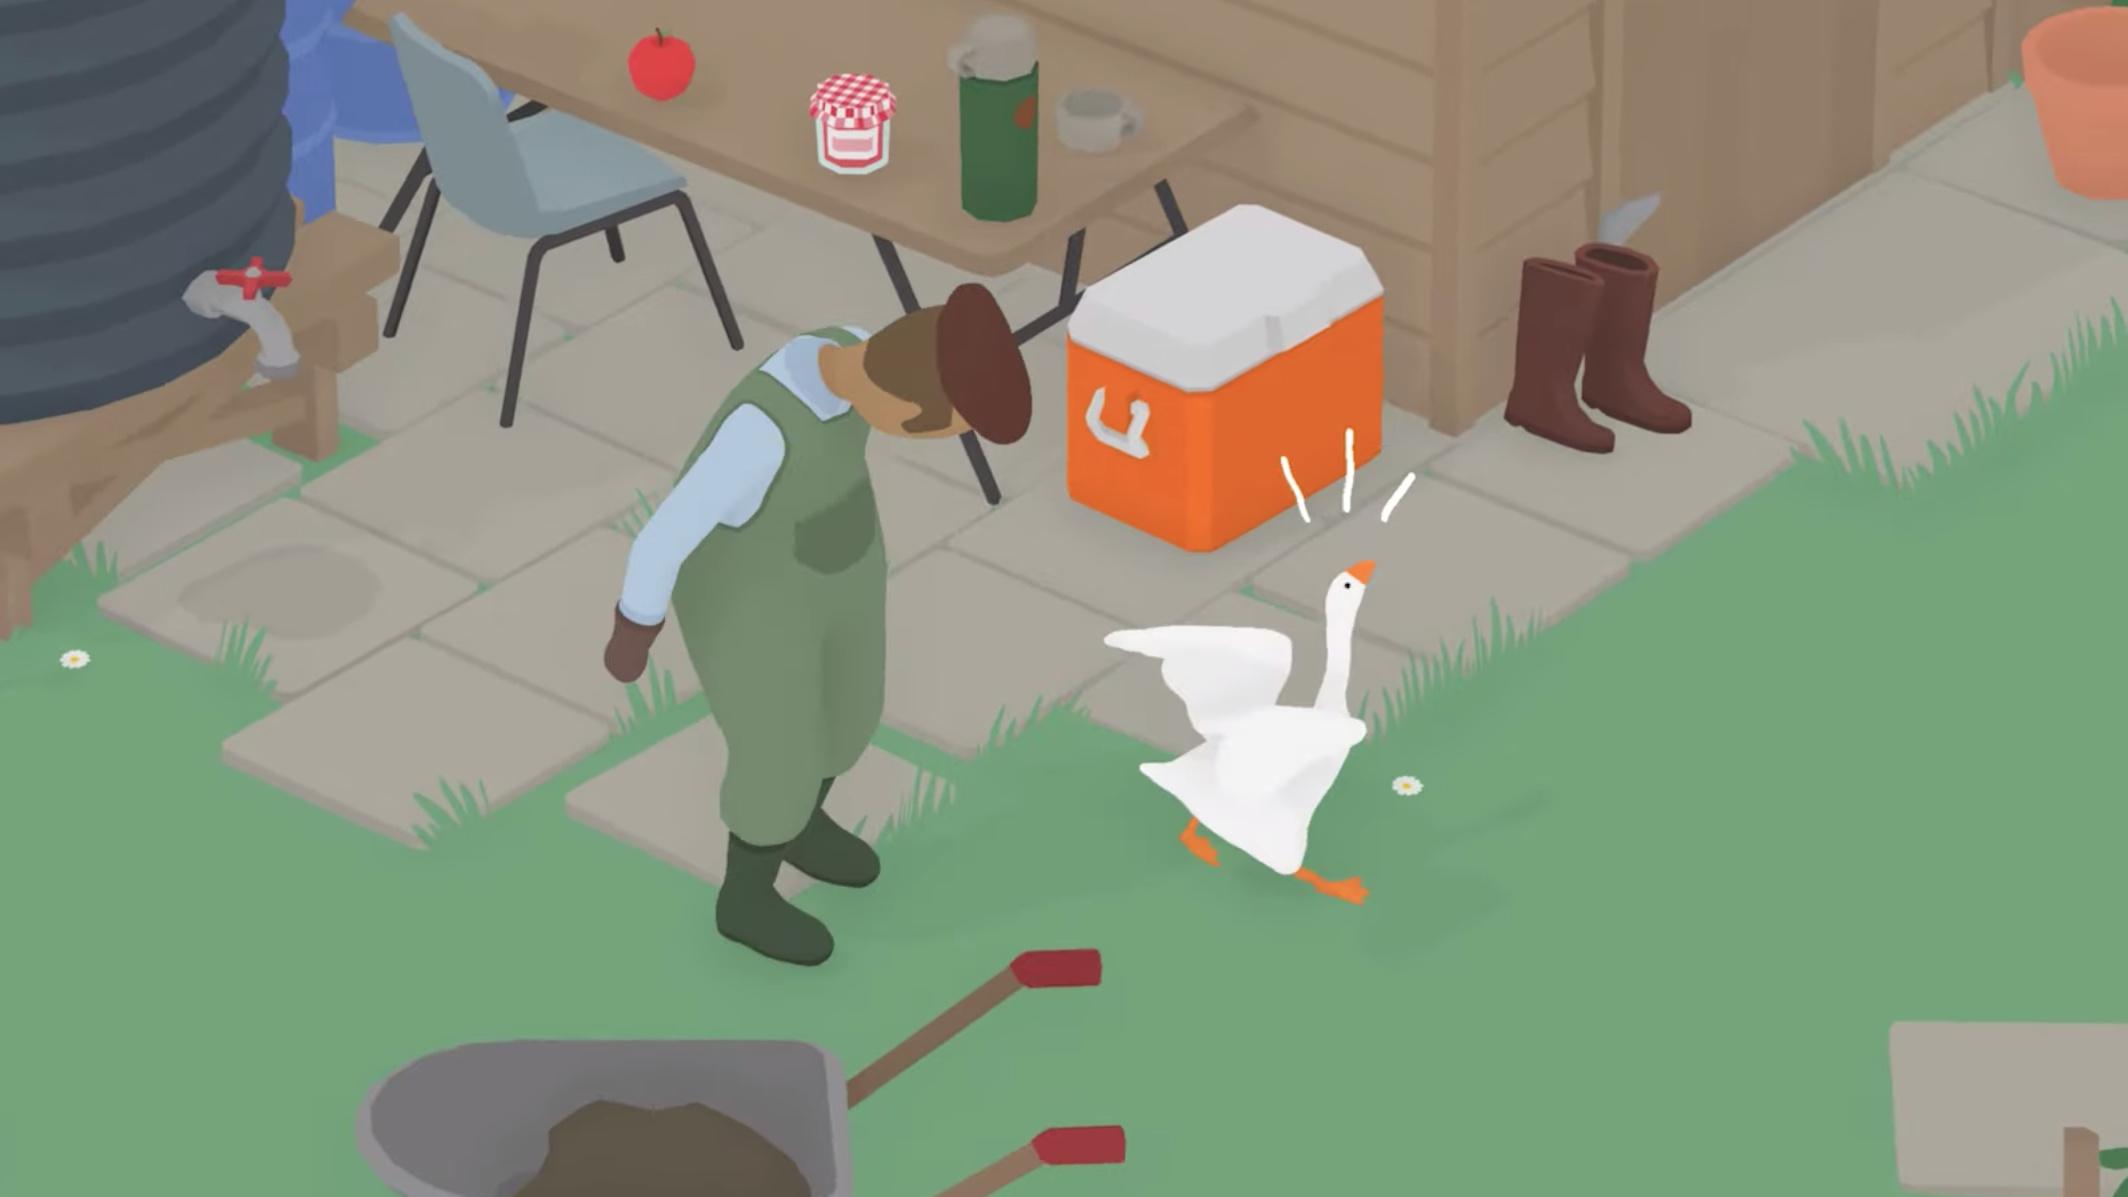 https://images.nintendolife.com/a5bc28eadabd1/untitled-goose-game.original.jpg